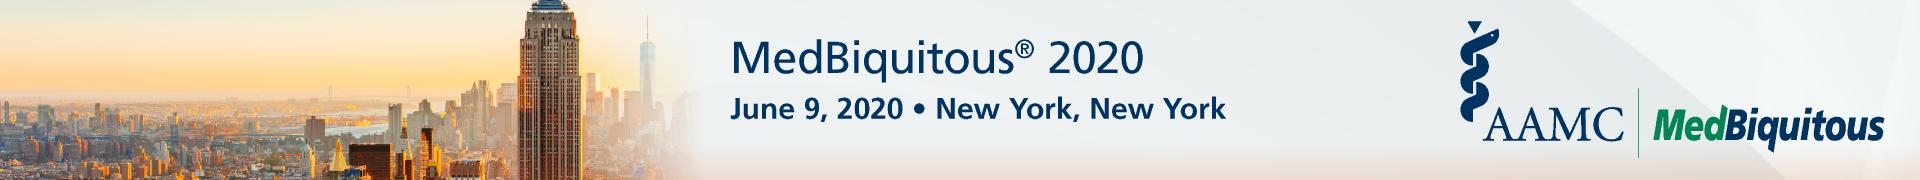 MedBiquitous 2020 Event Banner